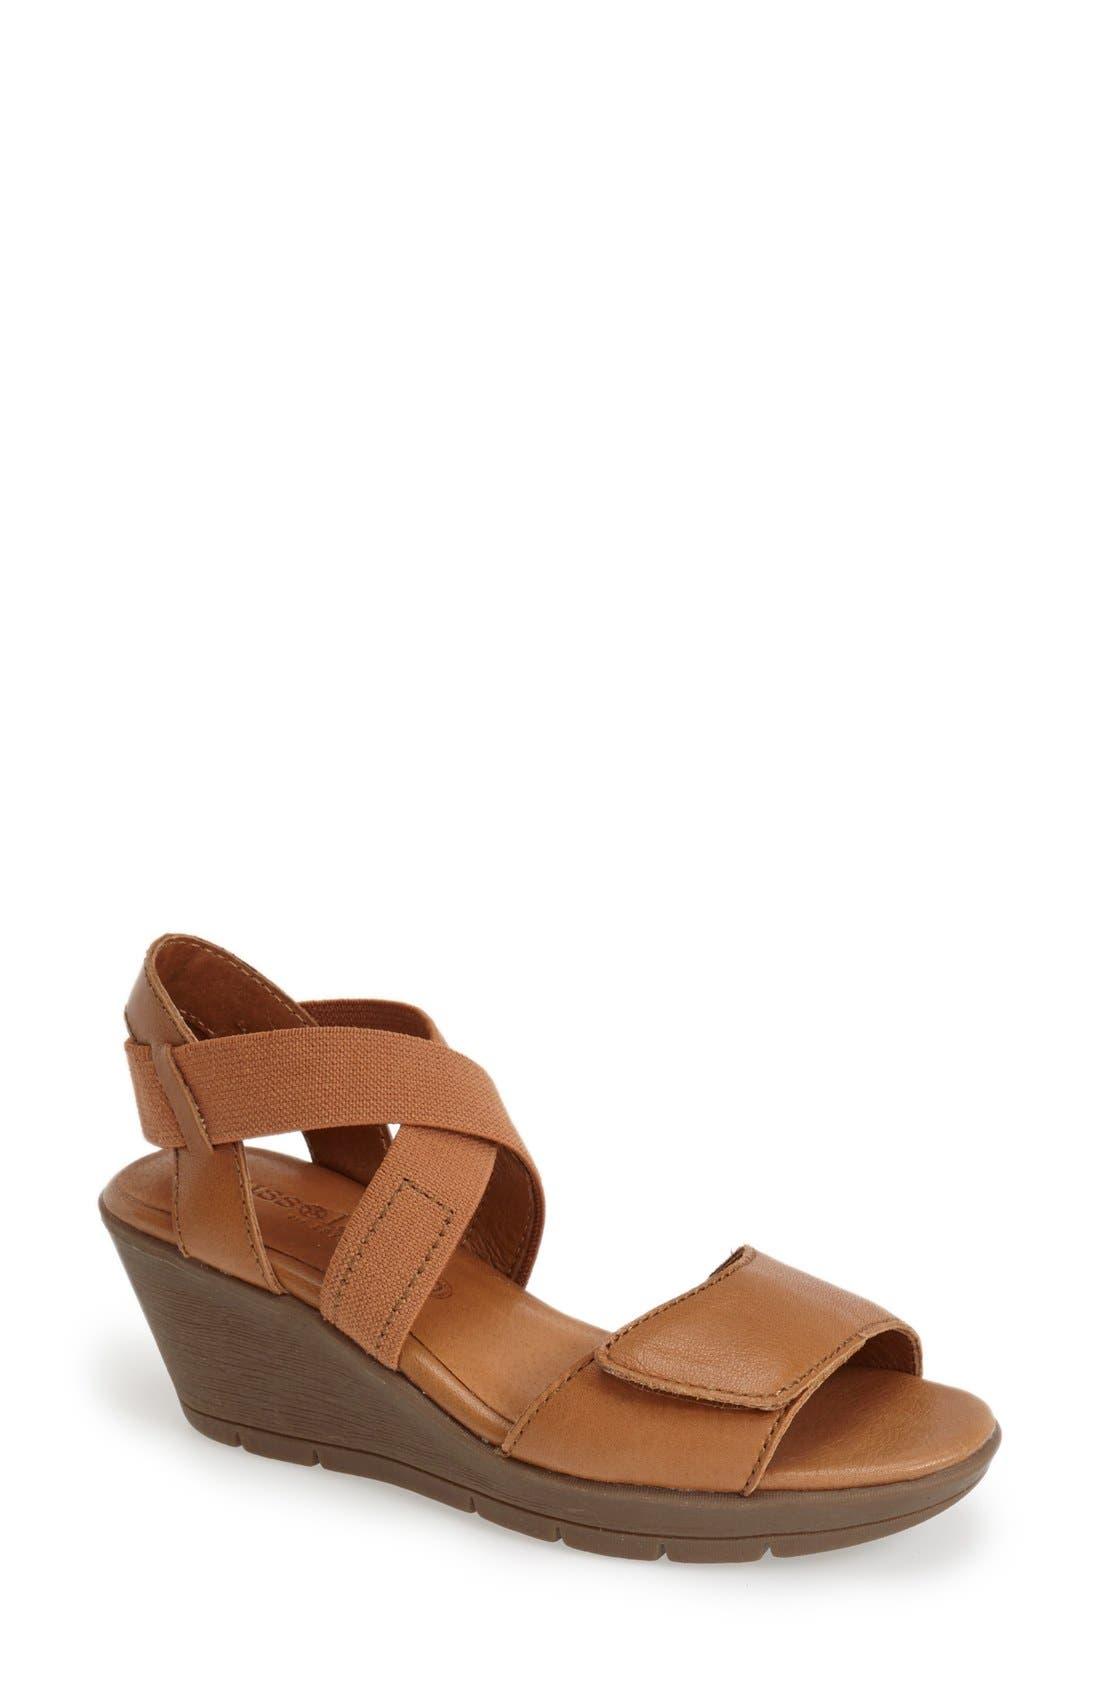 Main Image - Bussola 'Zumaia' Wedge Sandal (Women)